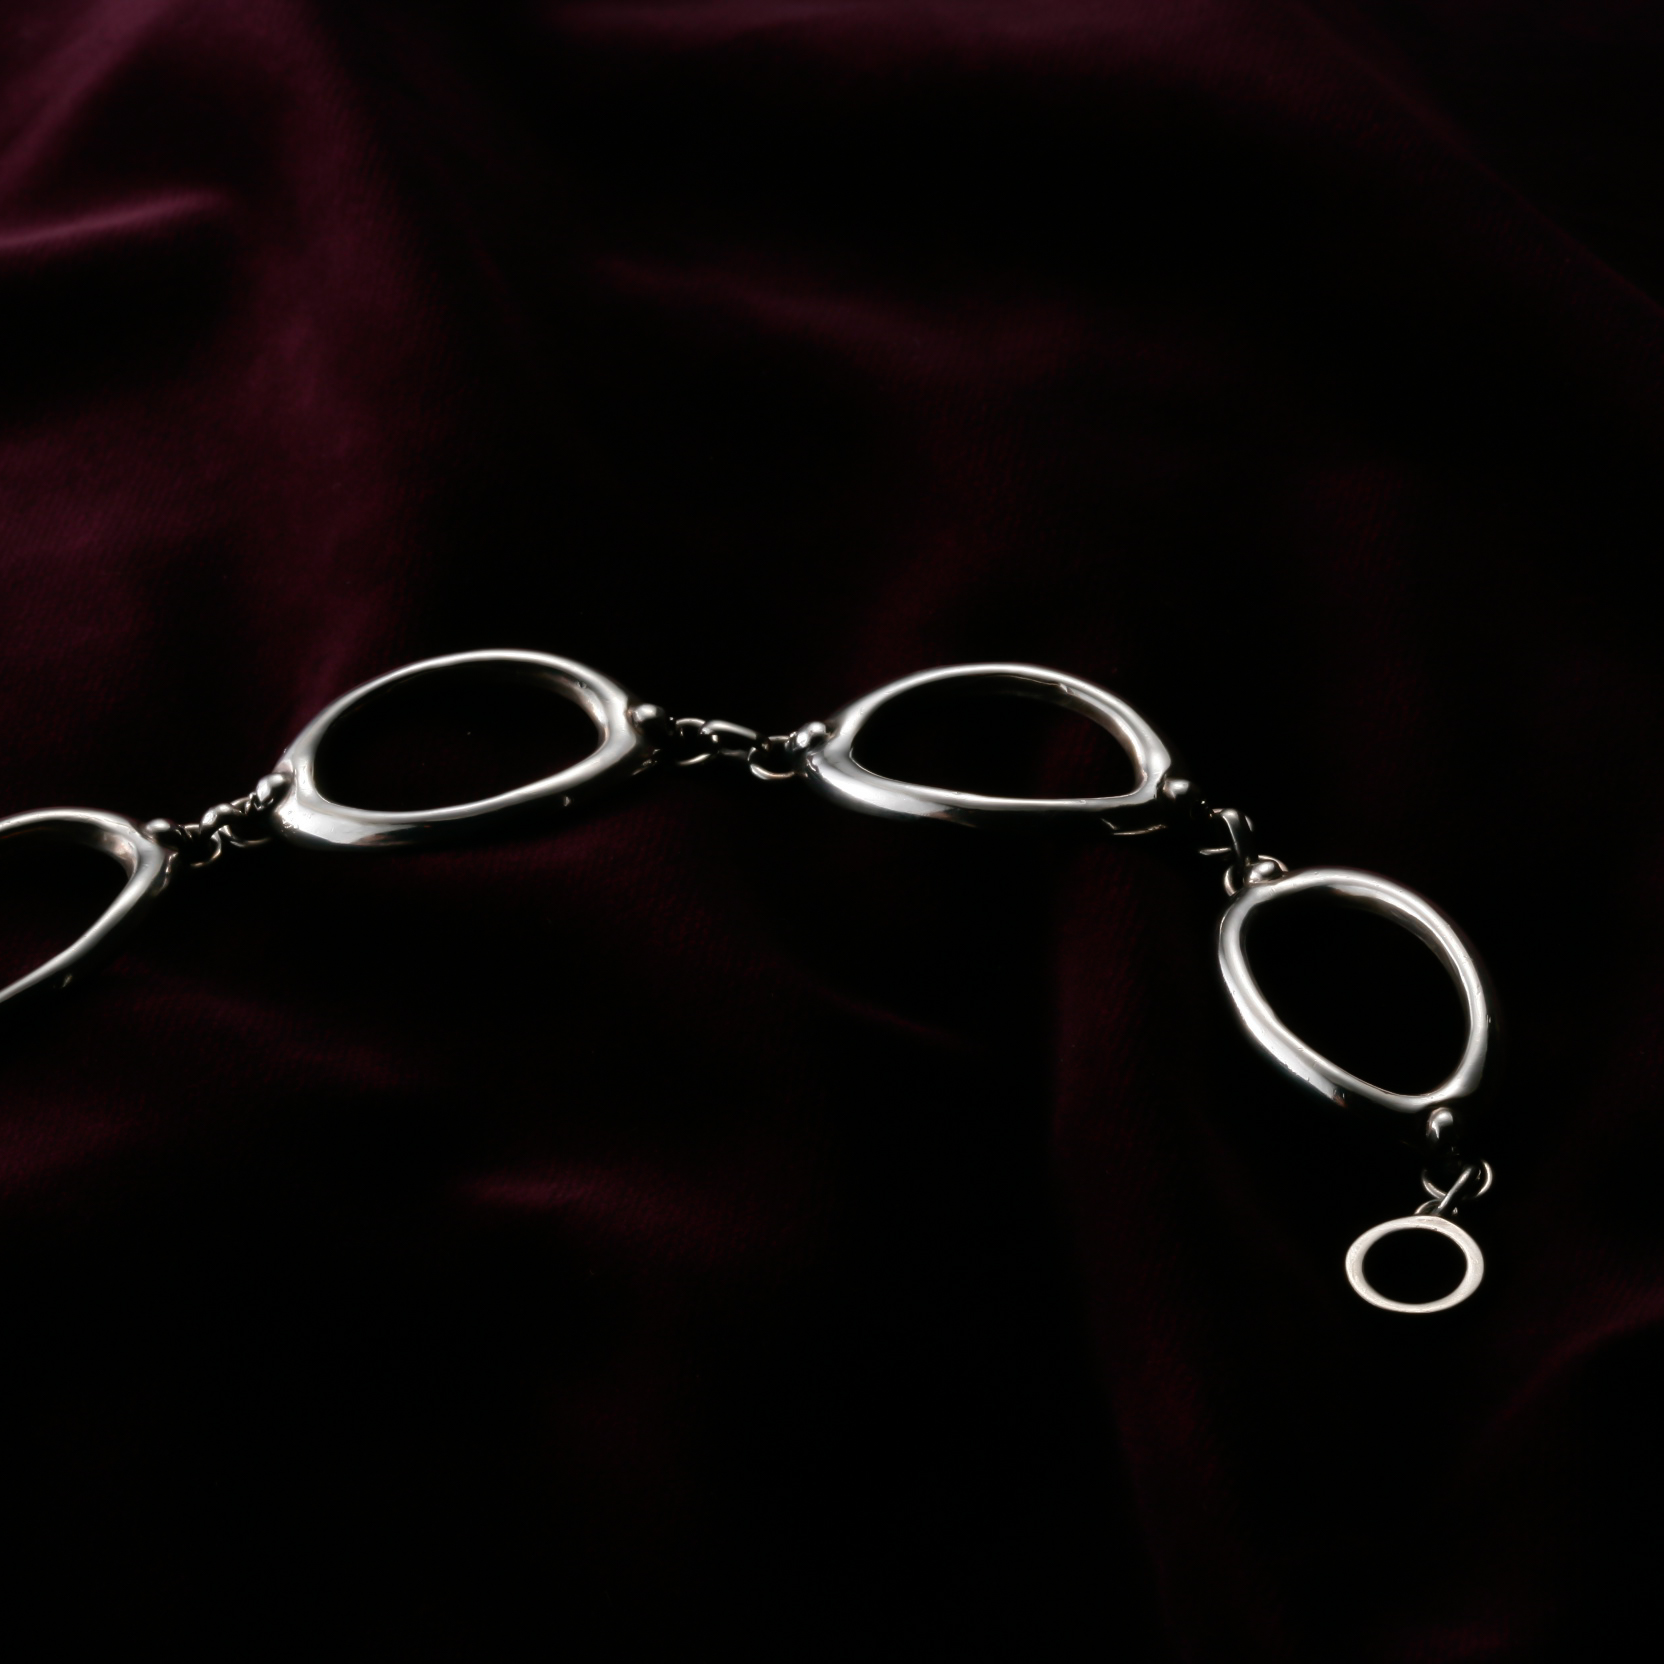 4 Ellipse on Small Skull Object Bracelet